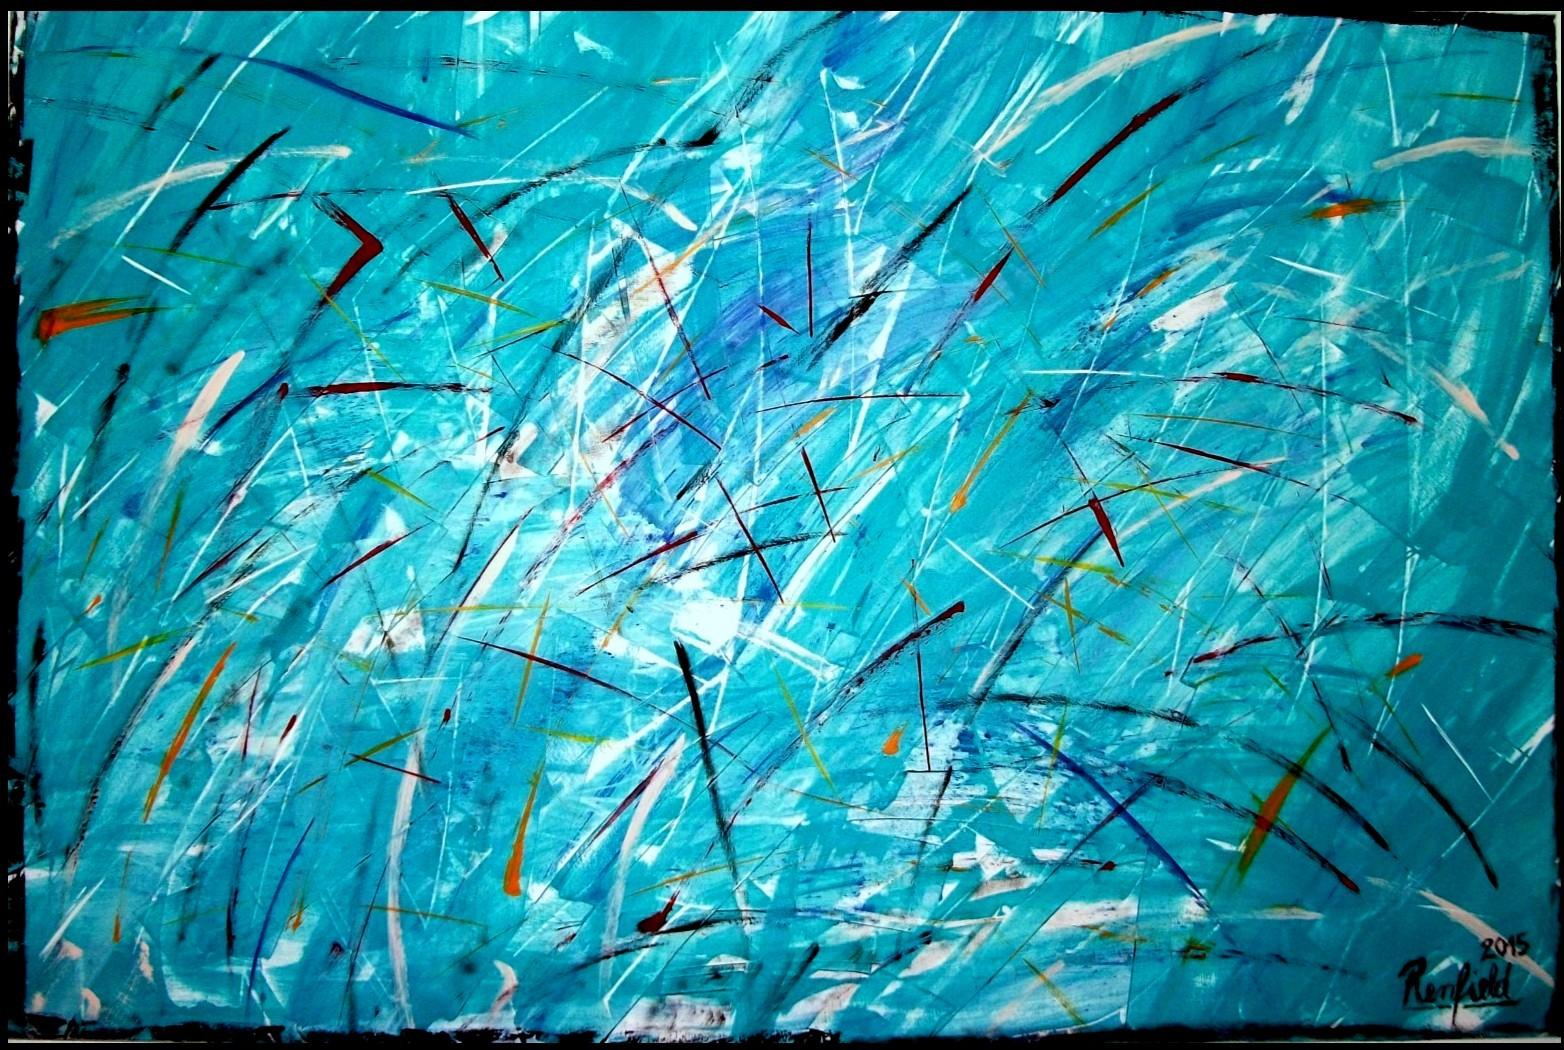 Blue Vision 3 (150 x 100) Acryl auf Leinwand